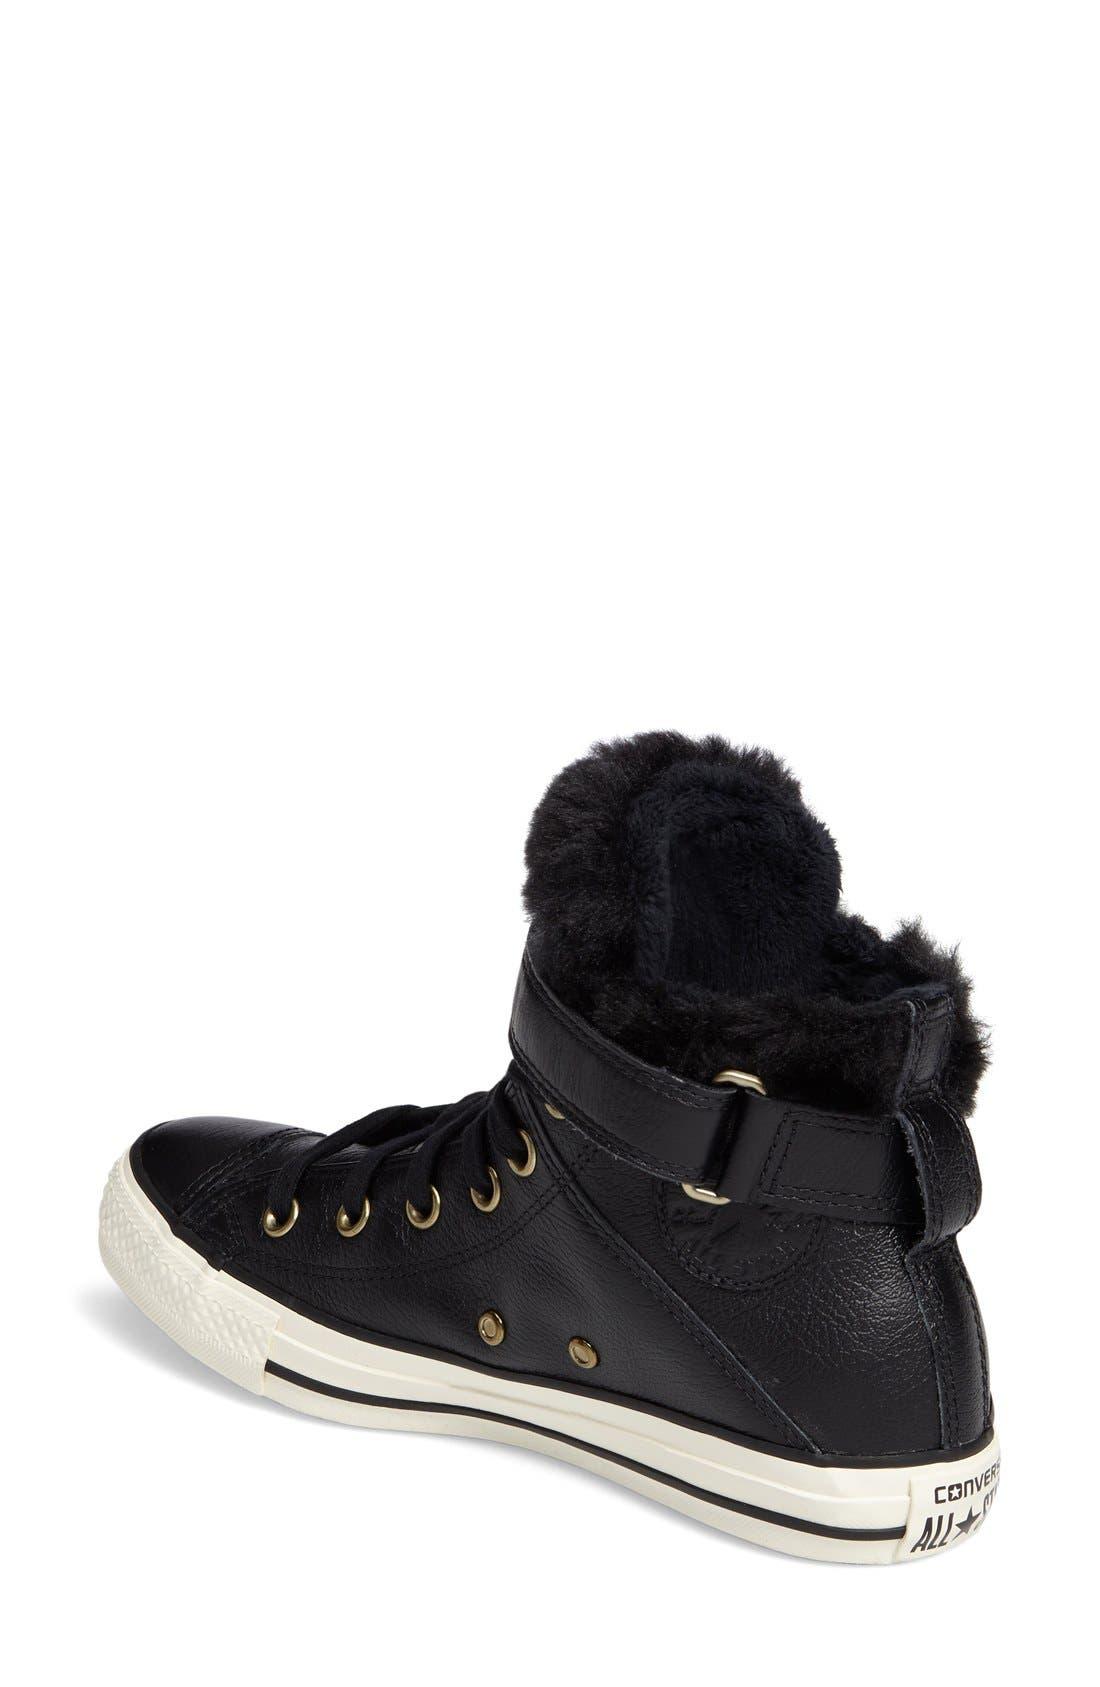 Alternate Image 2  - Converse Chuck Taylor® All Star® Faux Fur High Top Sneaker (Women)